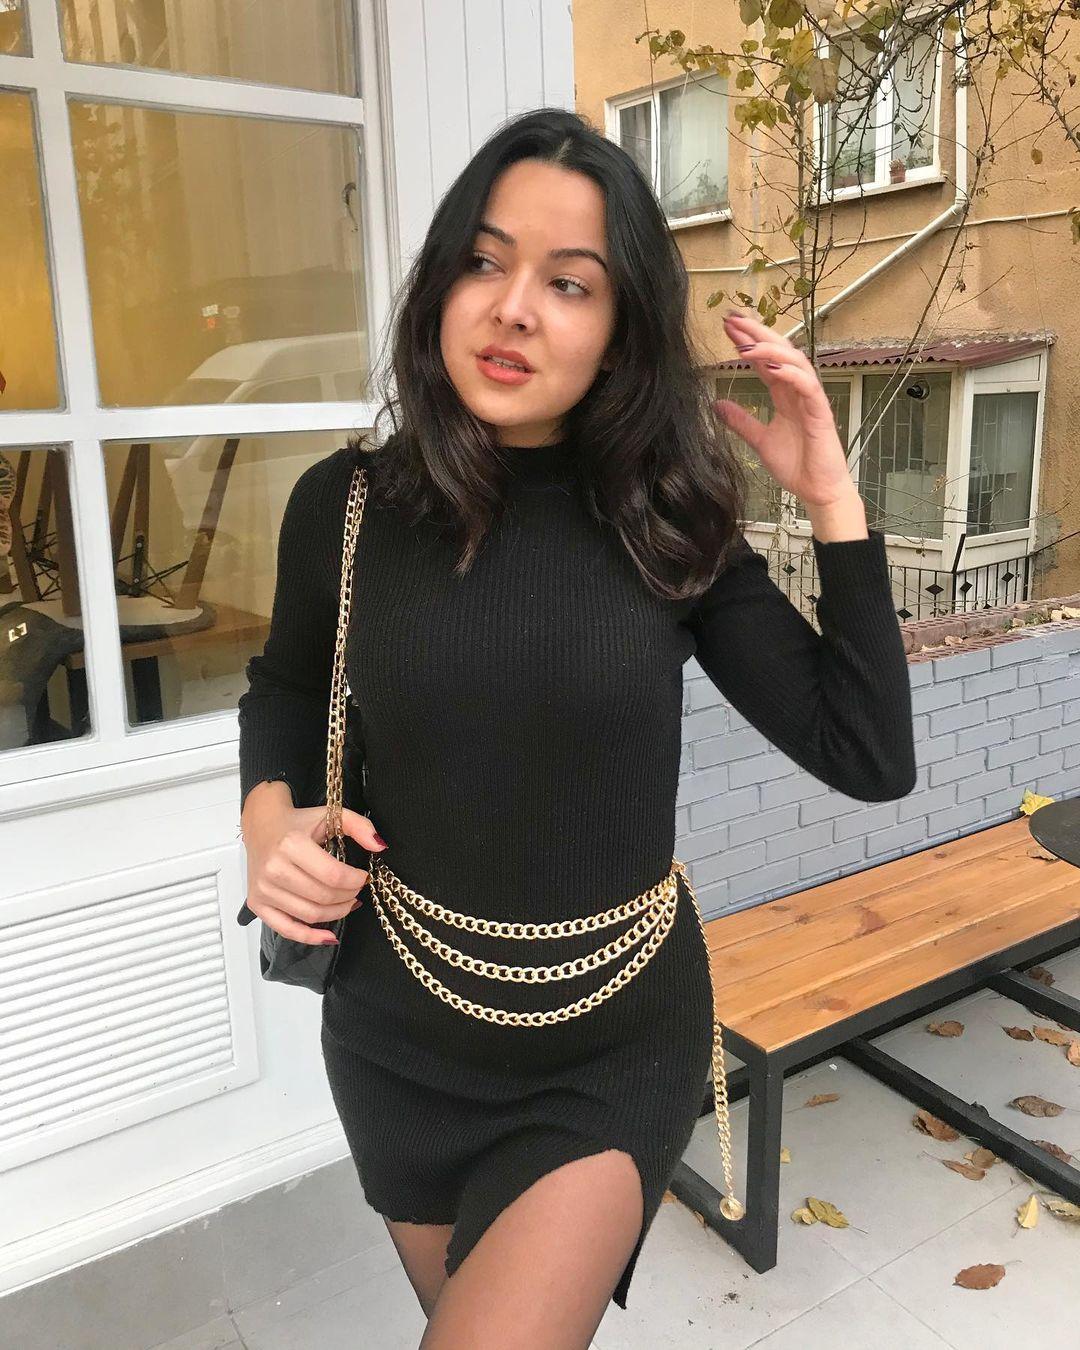 Ileyna-Savuk-Wallpapers-Insta-Fit-Bio-6